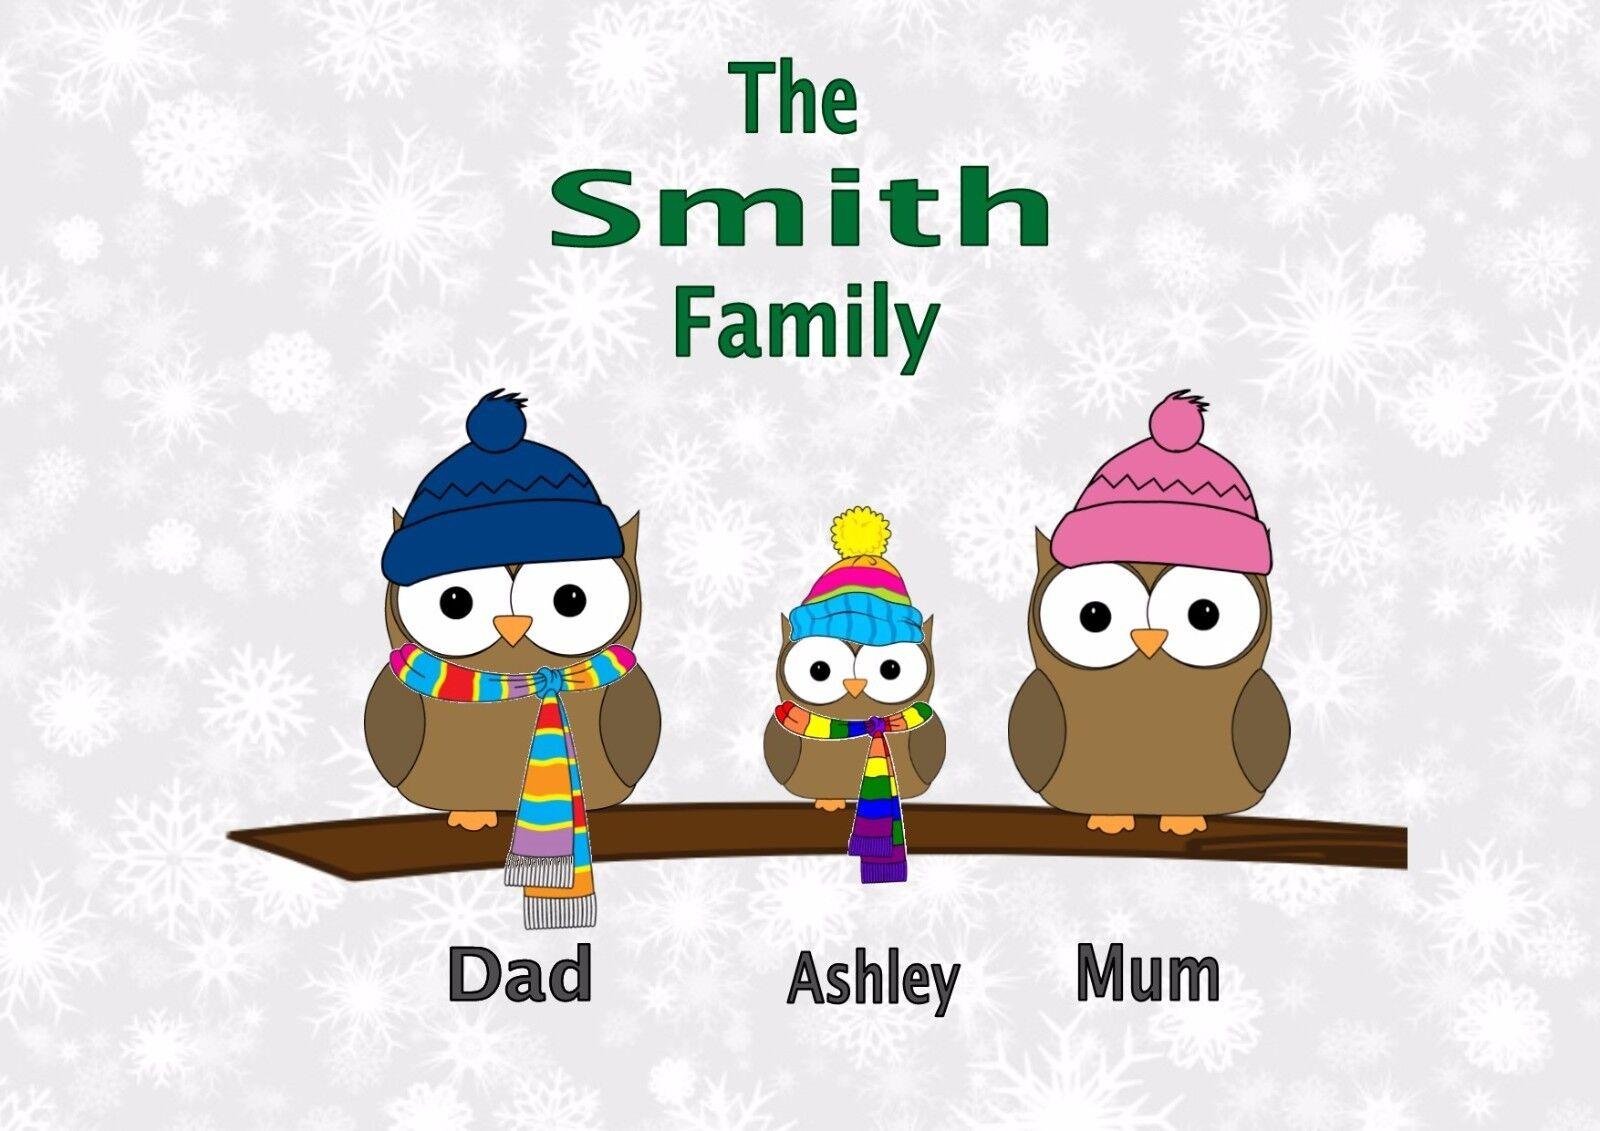 Buho De Invierno Personalizado Familia (1 Niño) A4 impresión (Sin marco), mamá, papá, familia